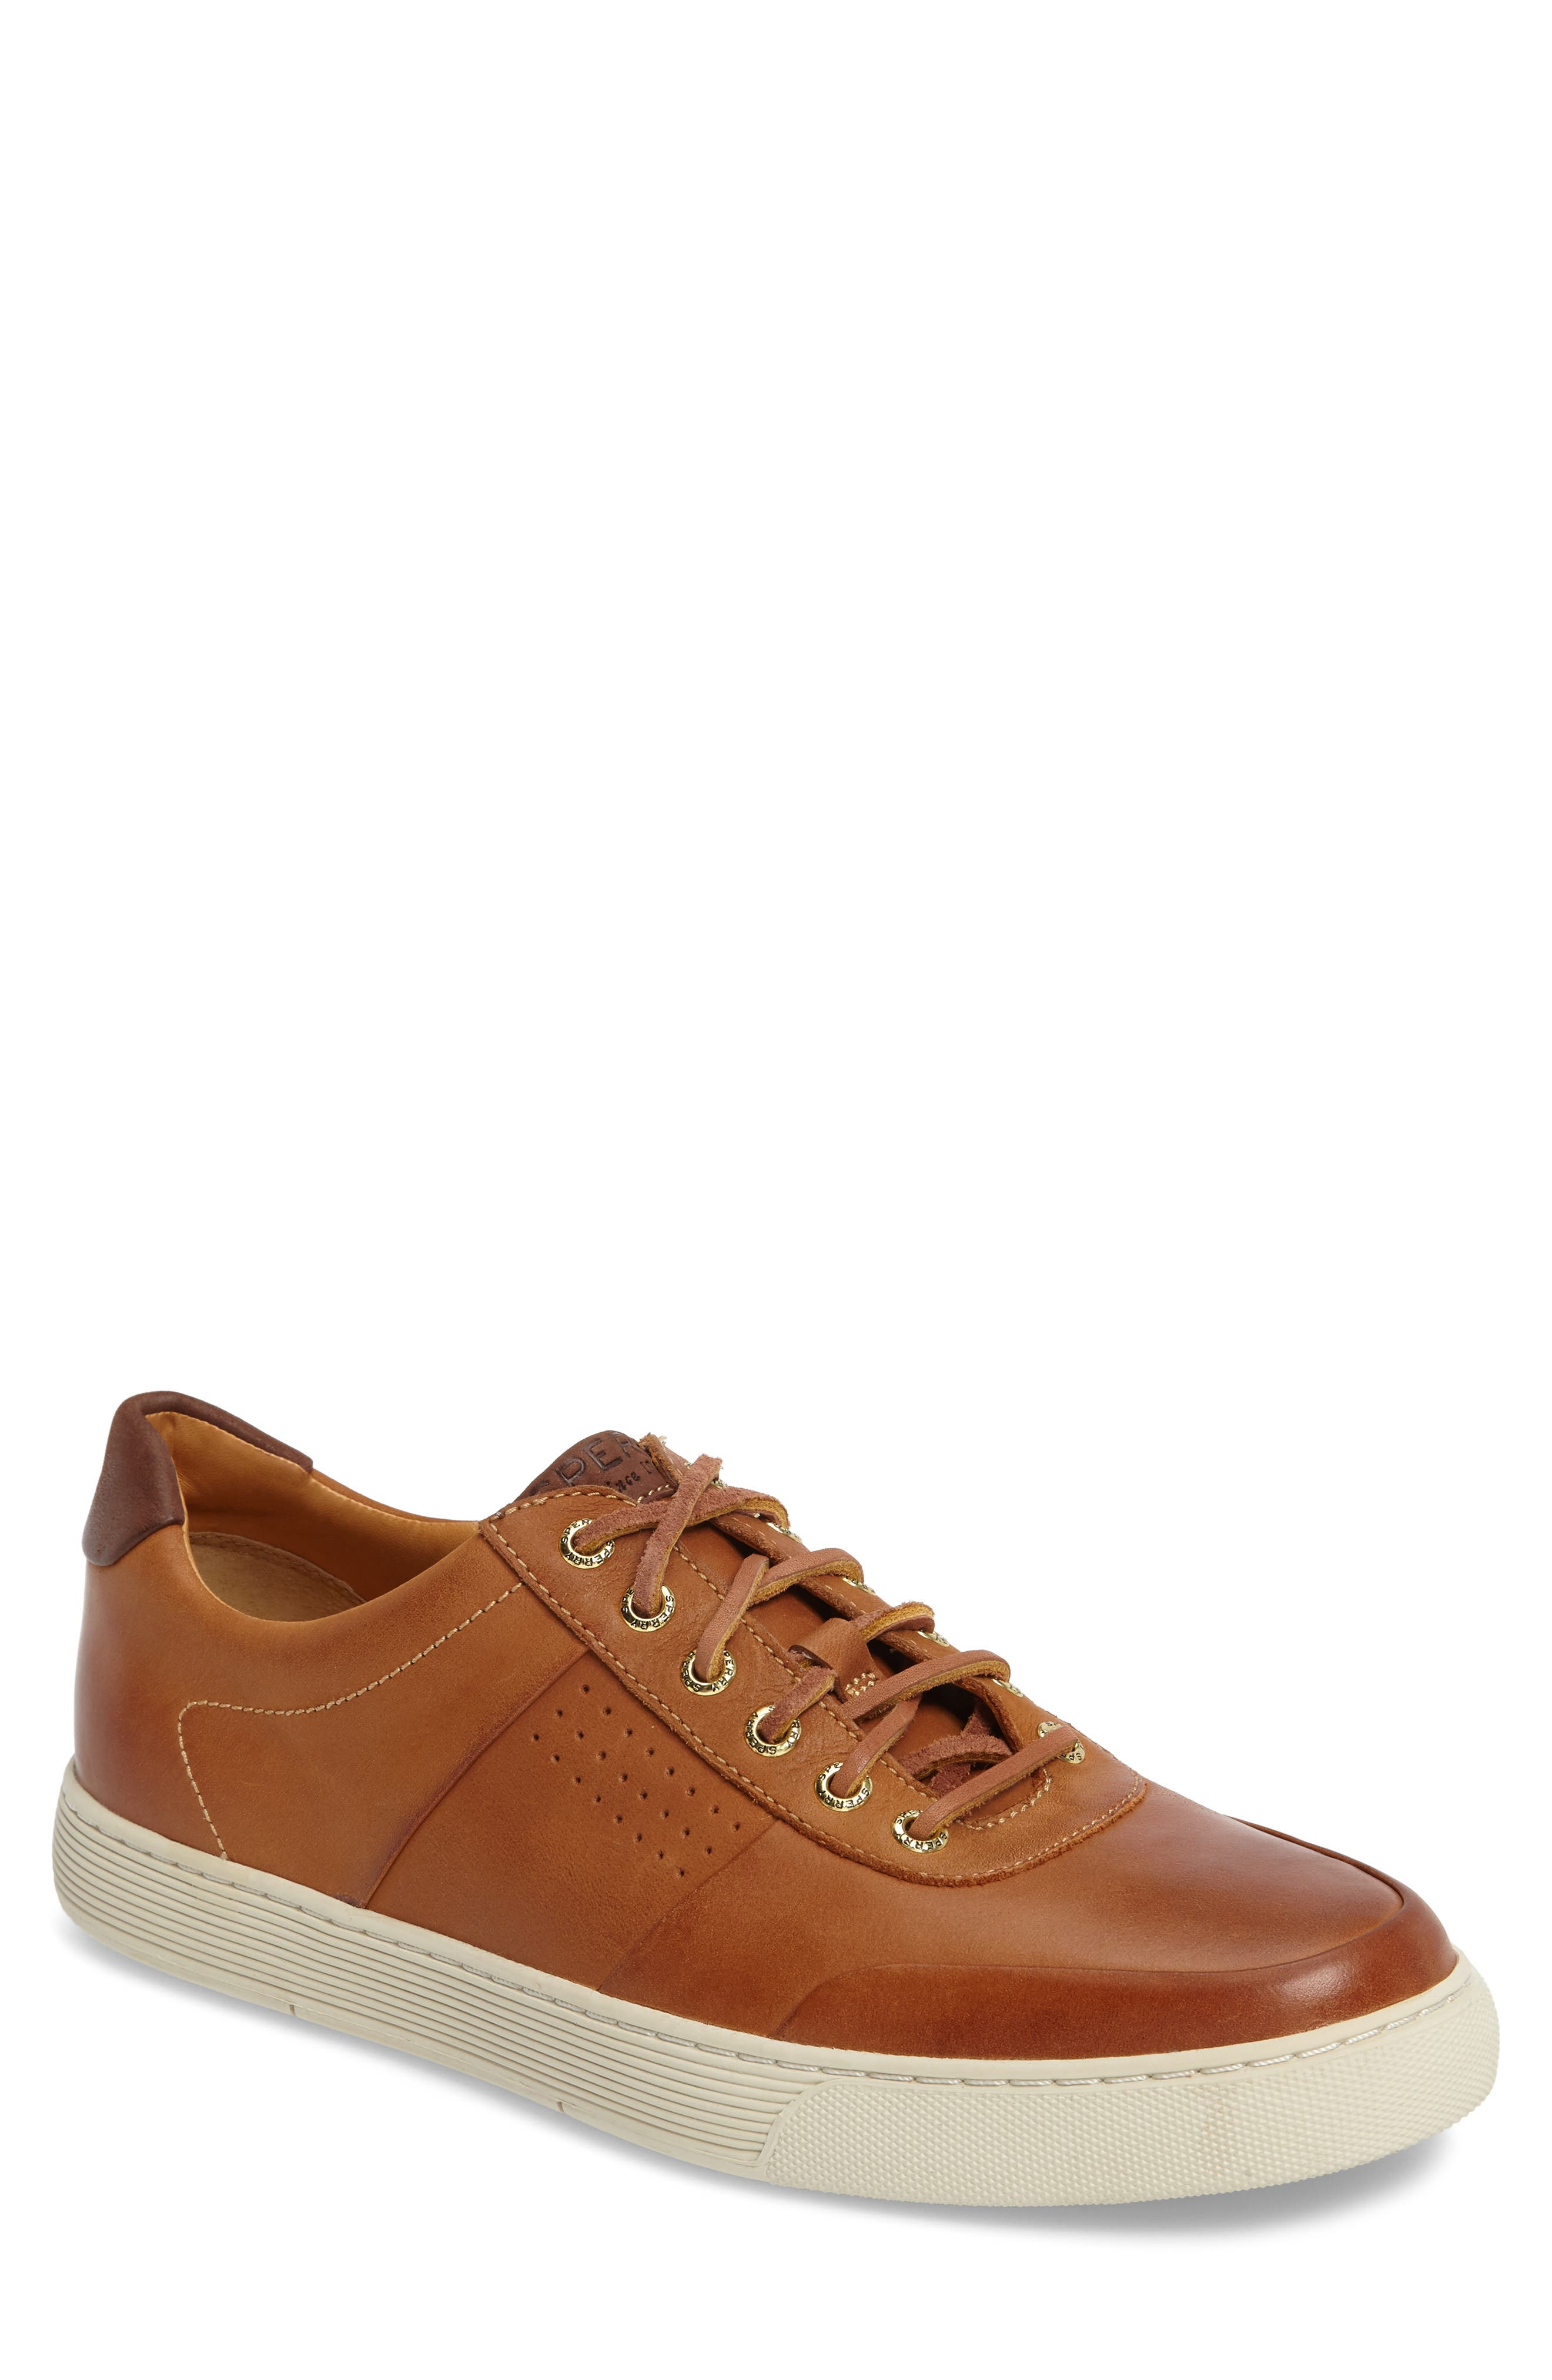 Gold Cup Sport Sneaker,                         Main,                         color, Tan